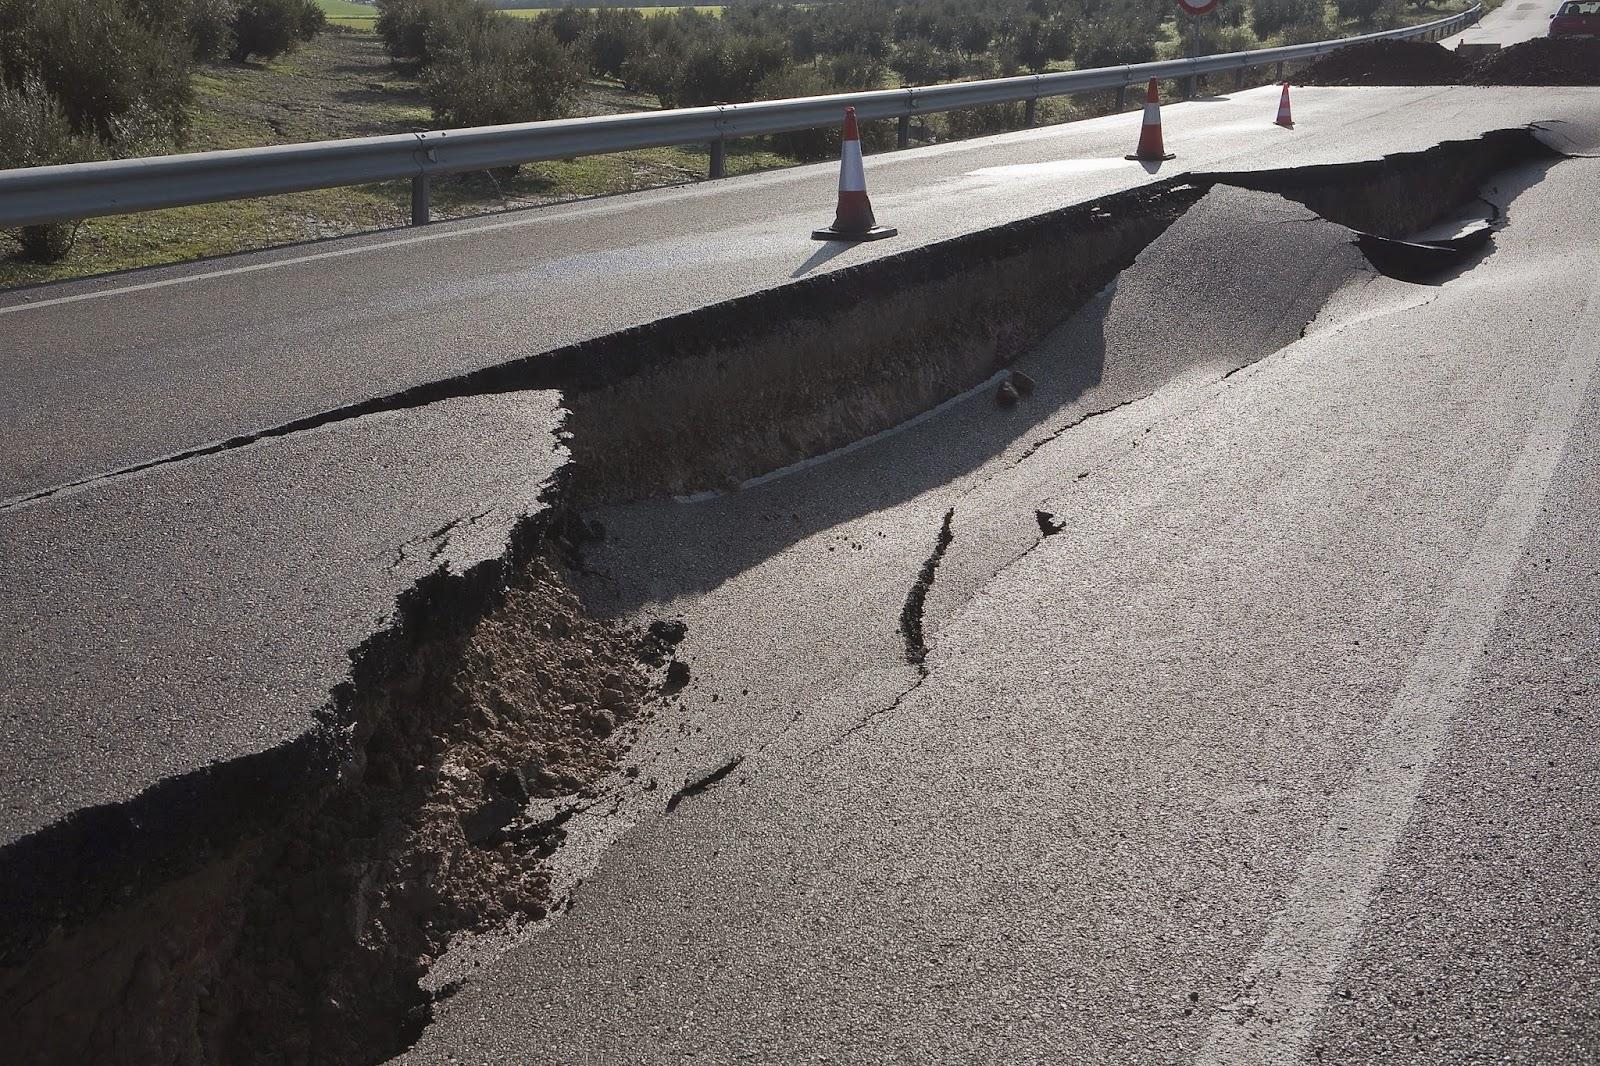 Road damaged by a sinkhole